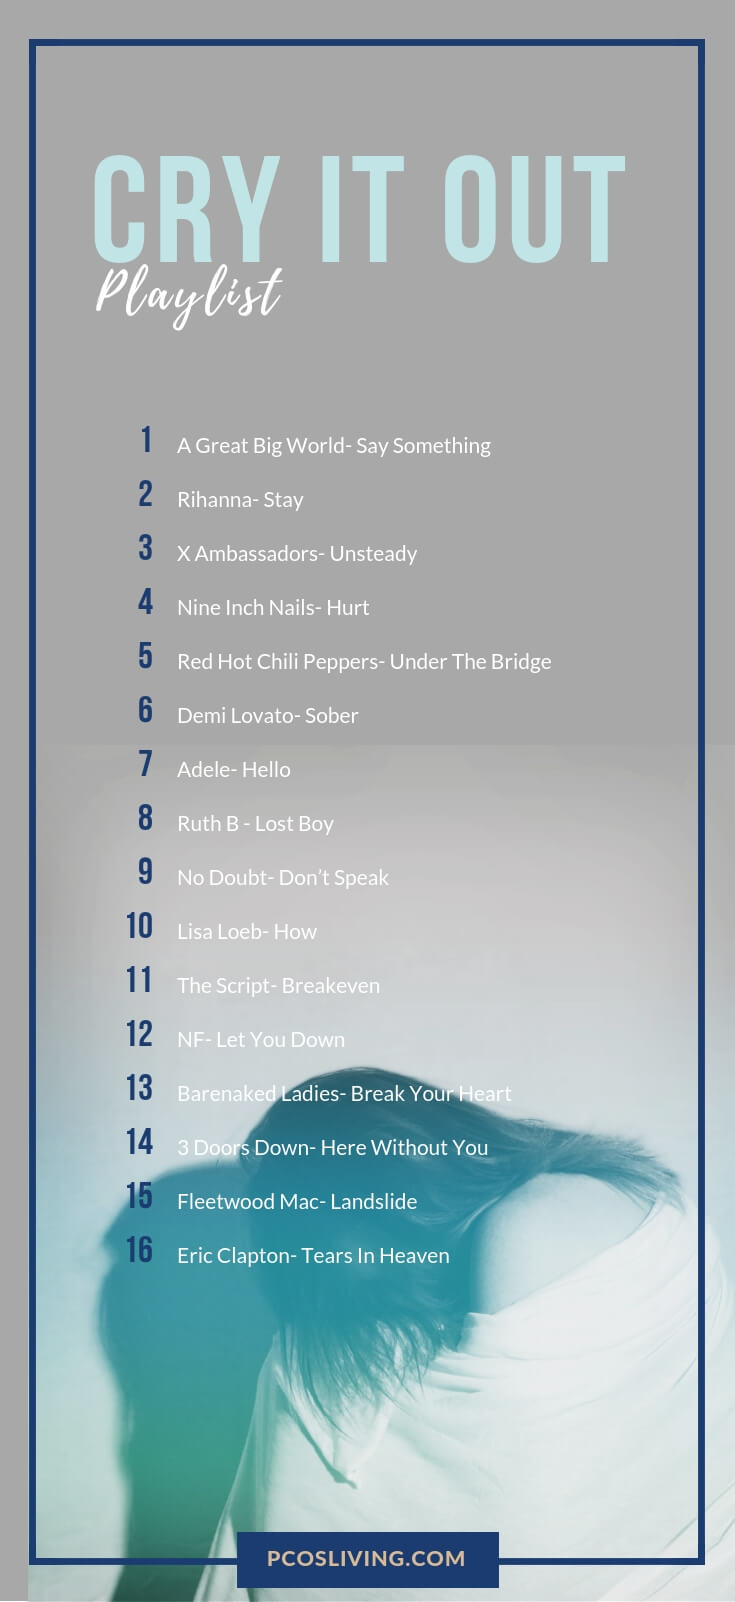 Cry it out Playlist // Sad Songs playlist // Sad songs when you need a cry // Feeling sad Playlist // Hard Times Playlist |  PCOSLiving.com  #playlist #sad